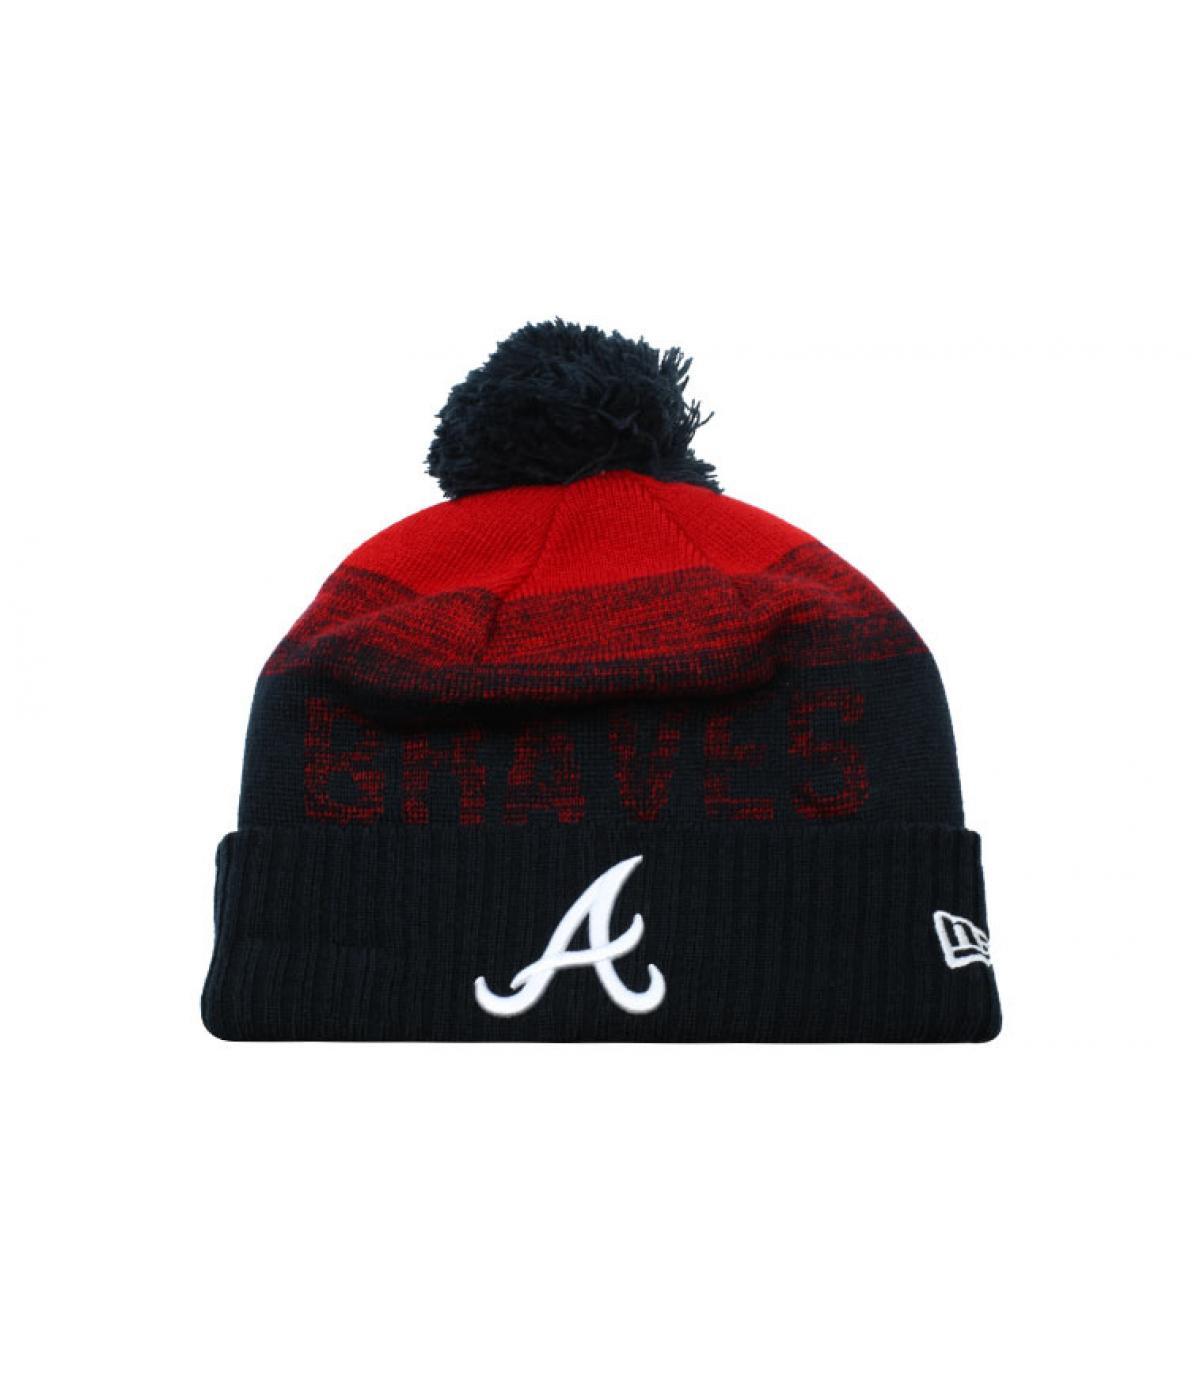 Dettagli MLB Sport Knit Atlanta - image 2